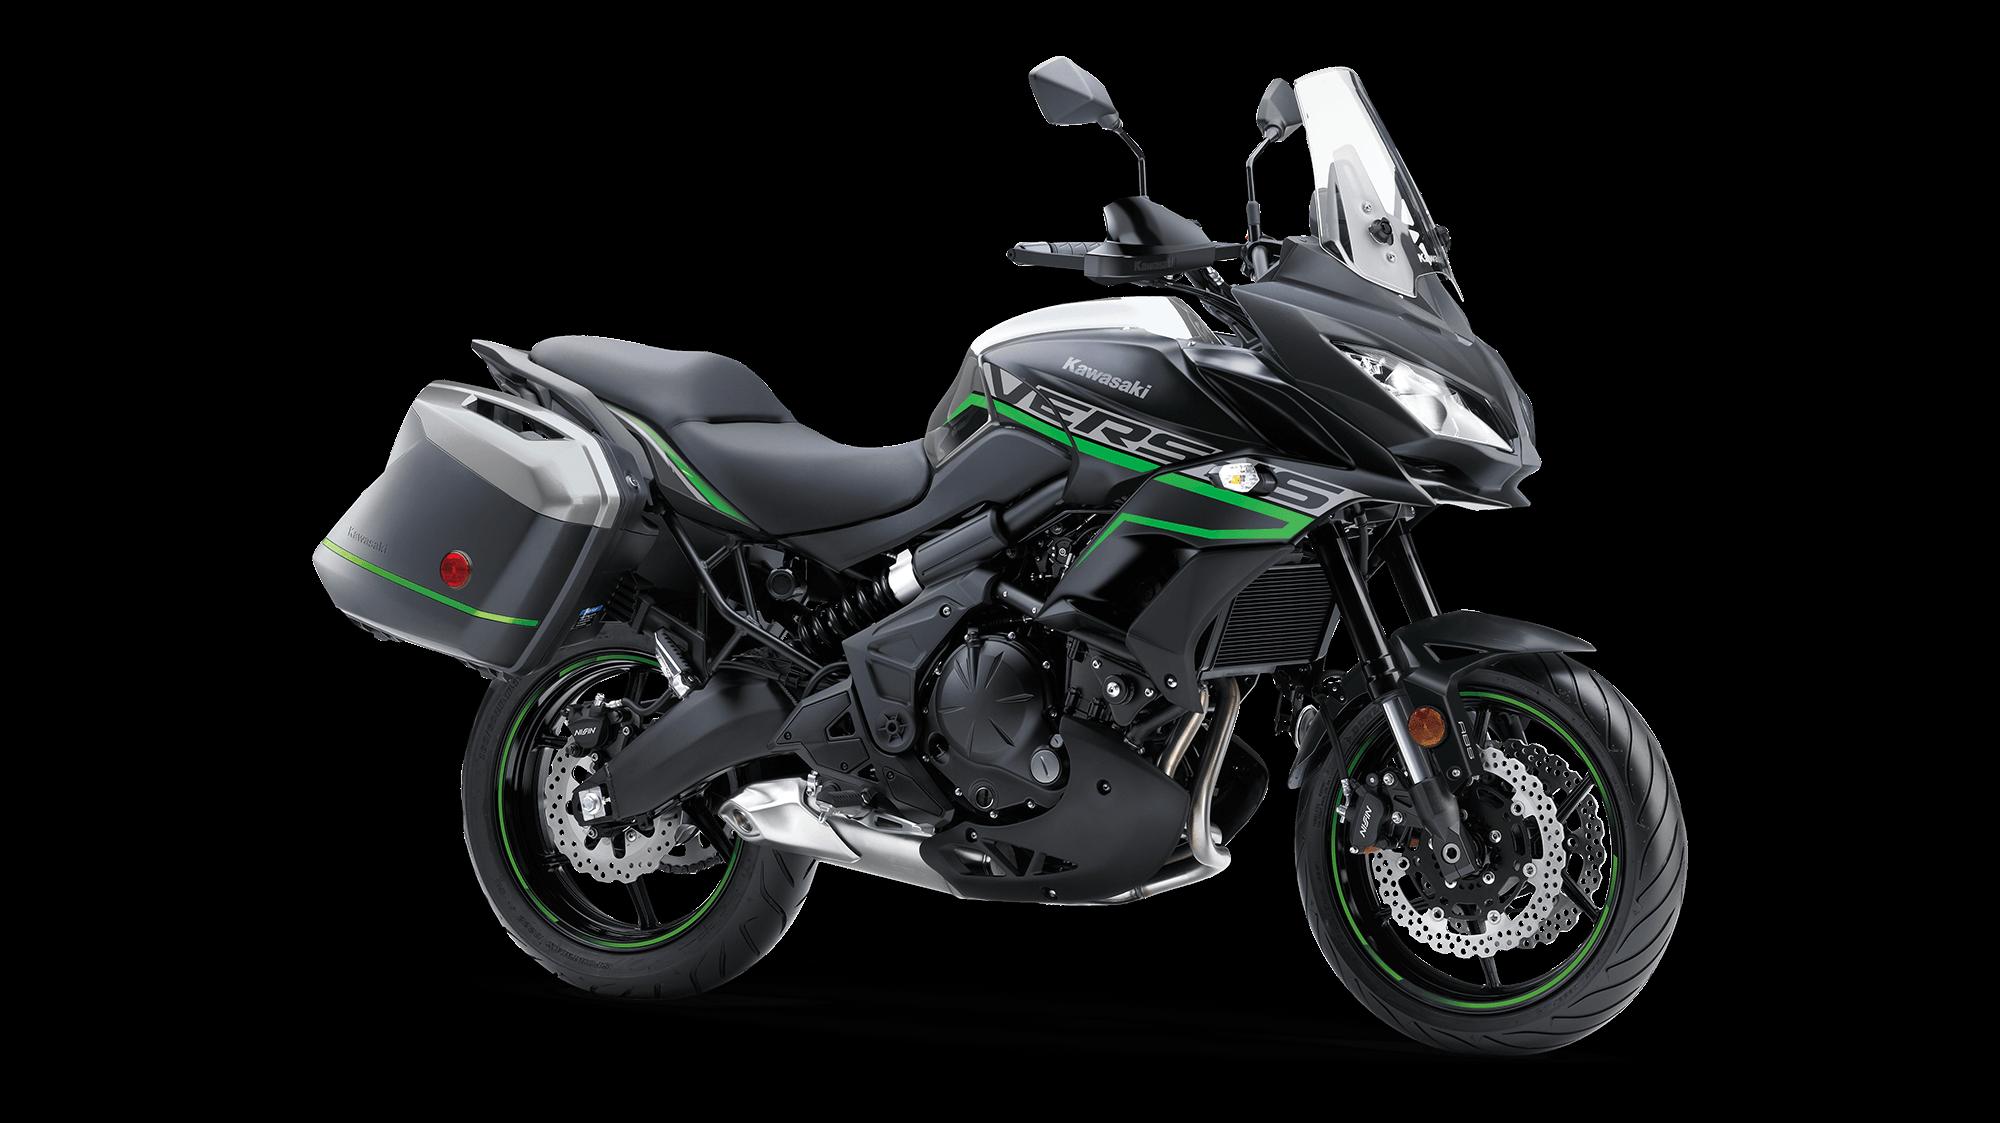 2019 Versys 650 Lt Motorcycle By Kawasaki Stx 15f Wiring Diagram